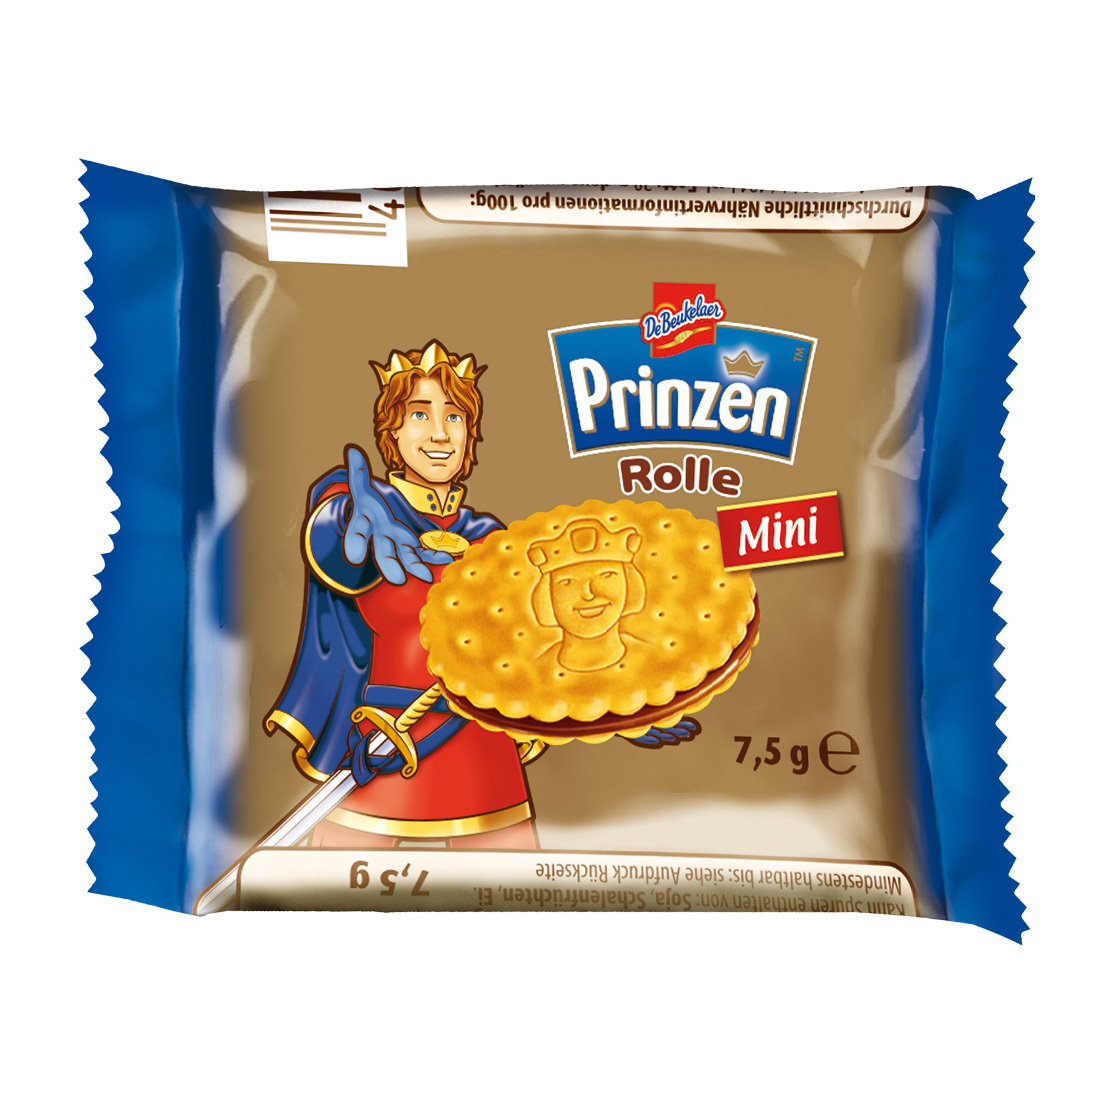 Prinzenrolle Mini